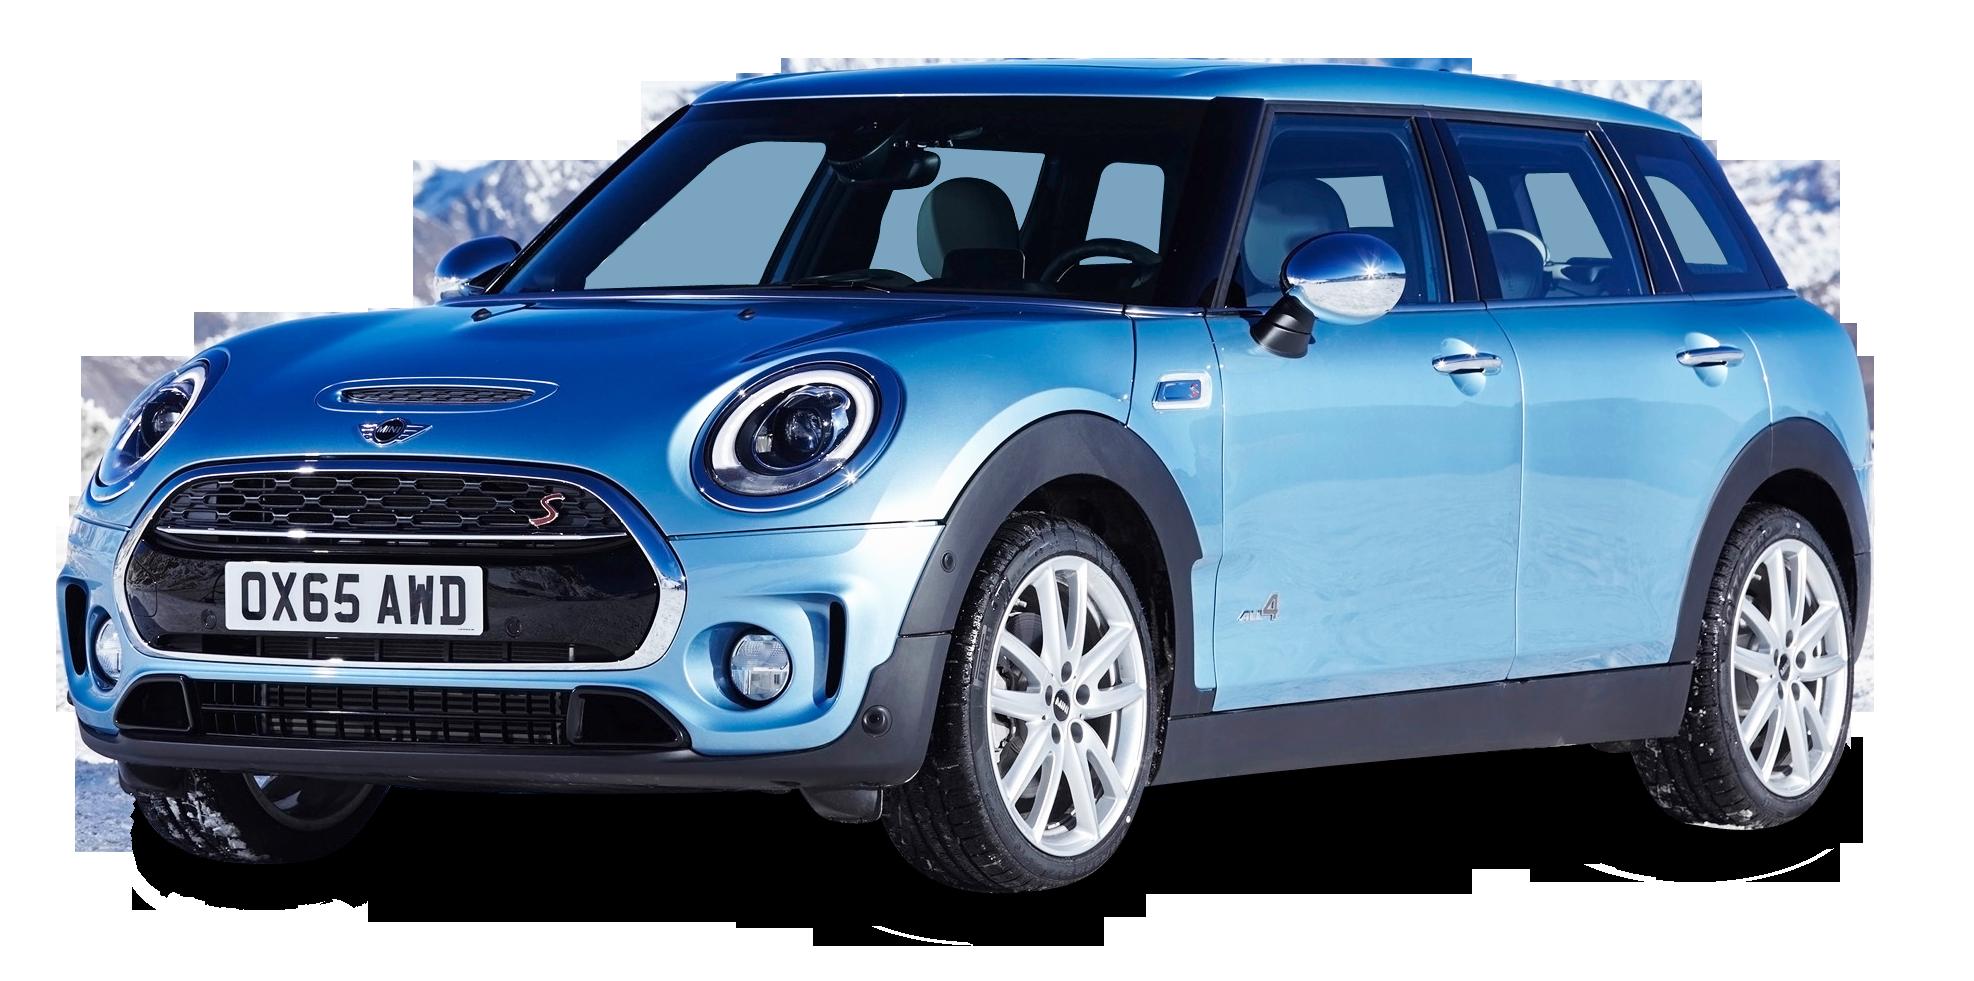 Blue Mini Clubman All4 AWD Car PNG Image PurePNG